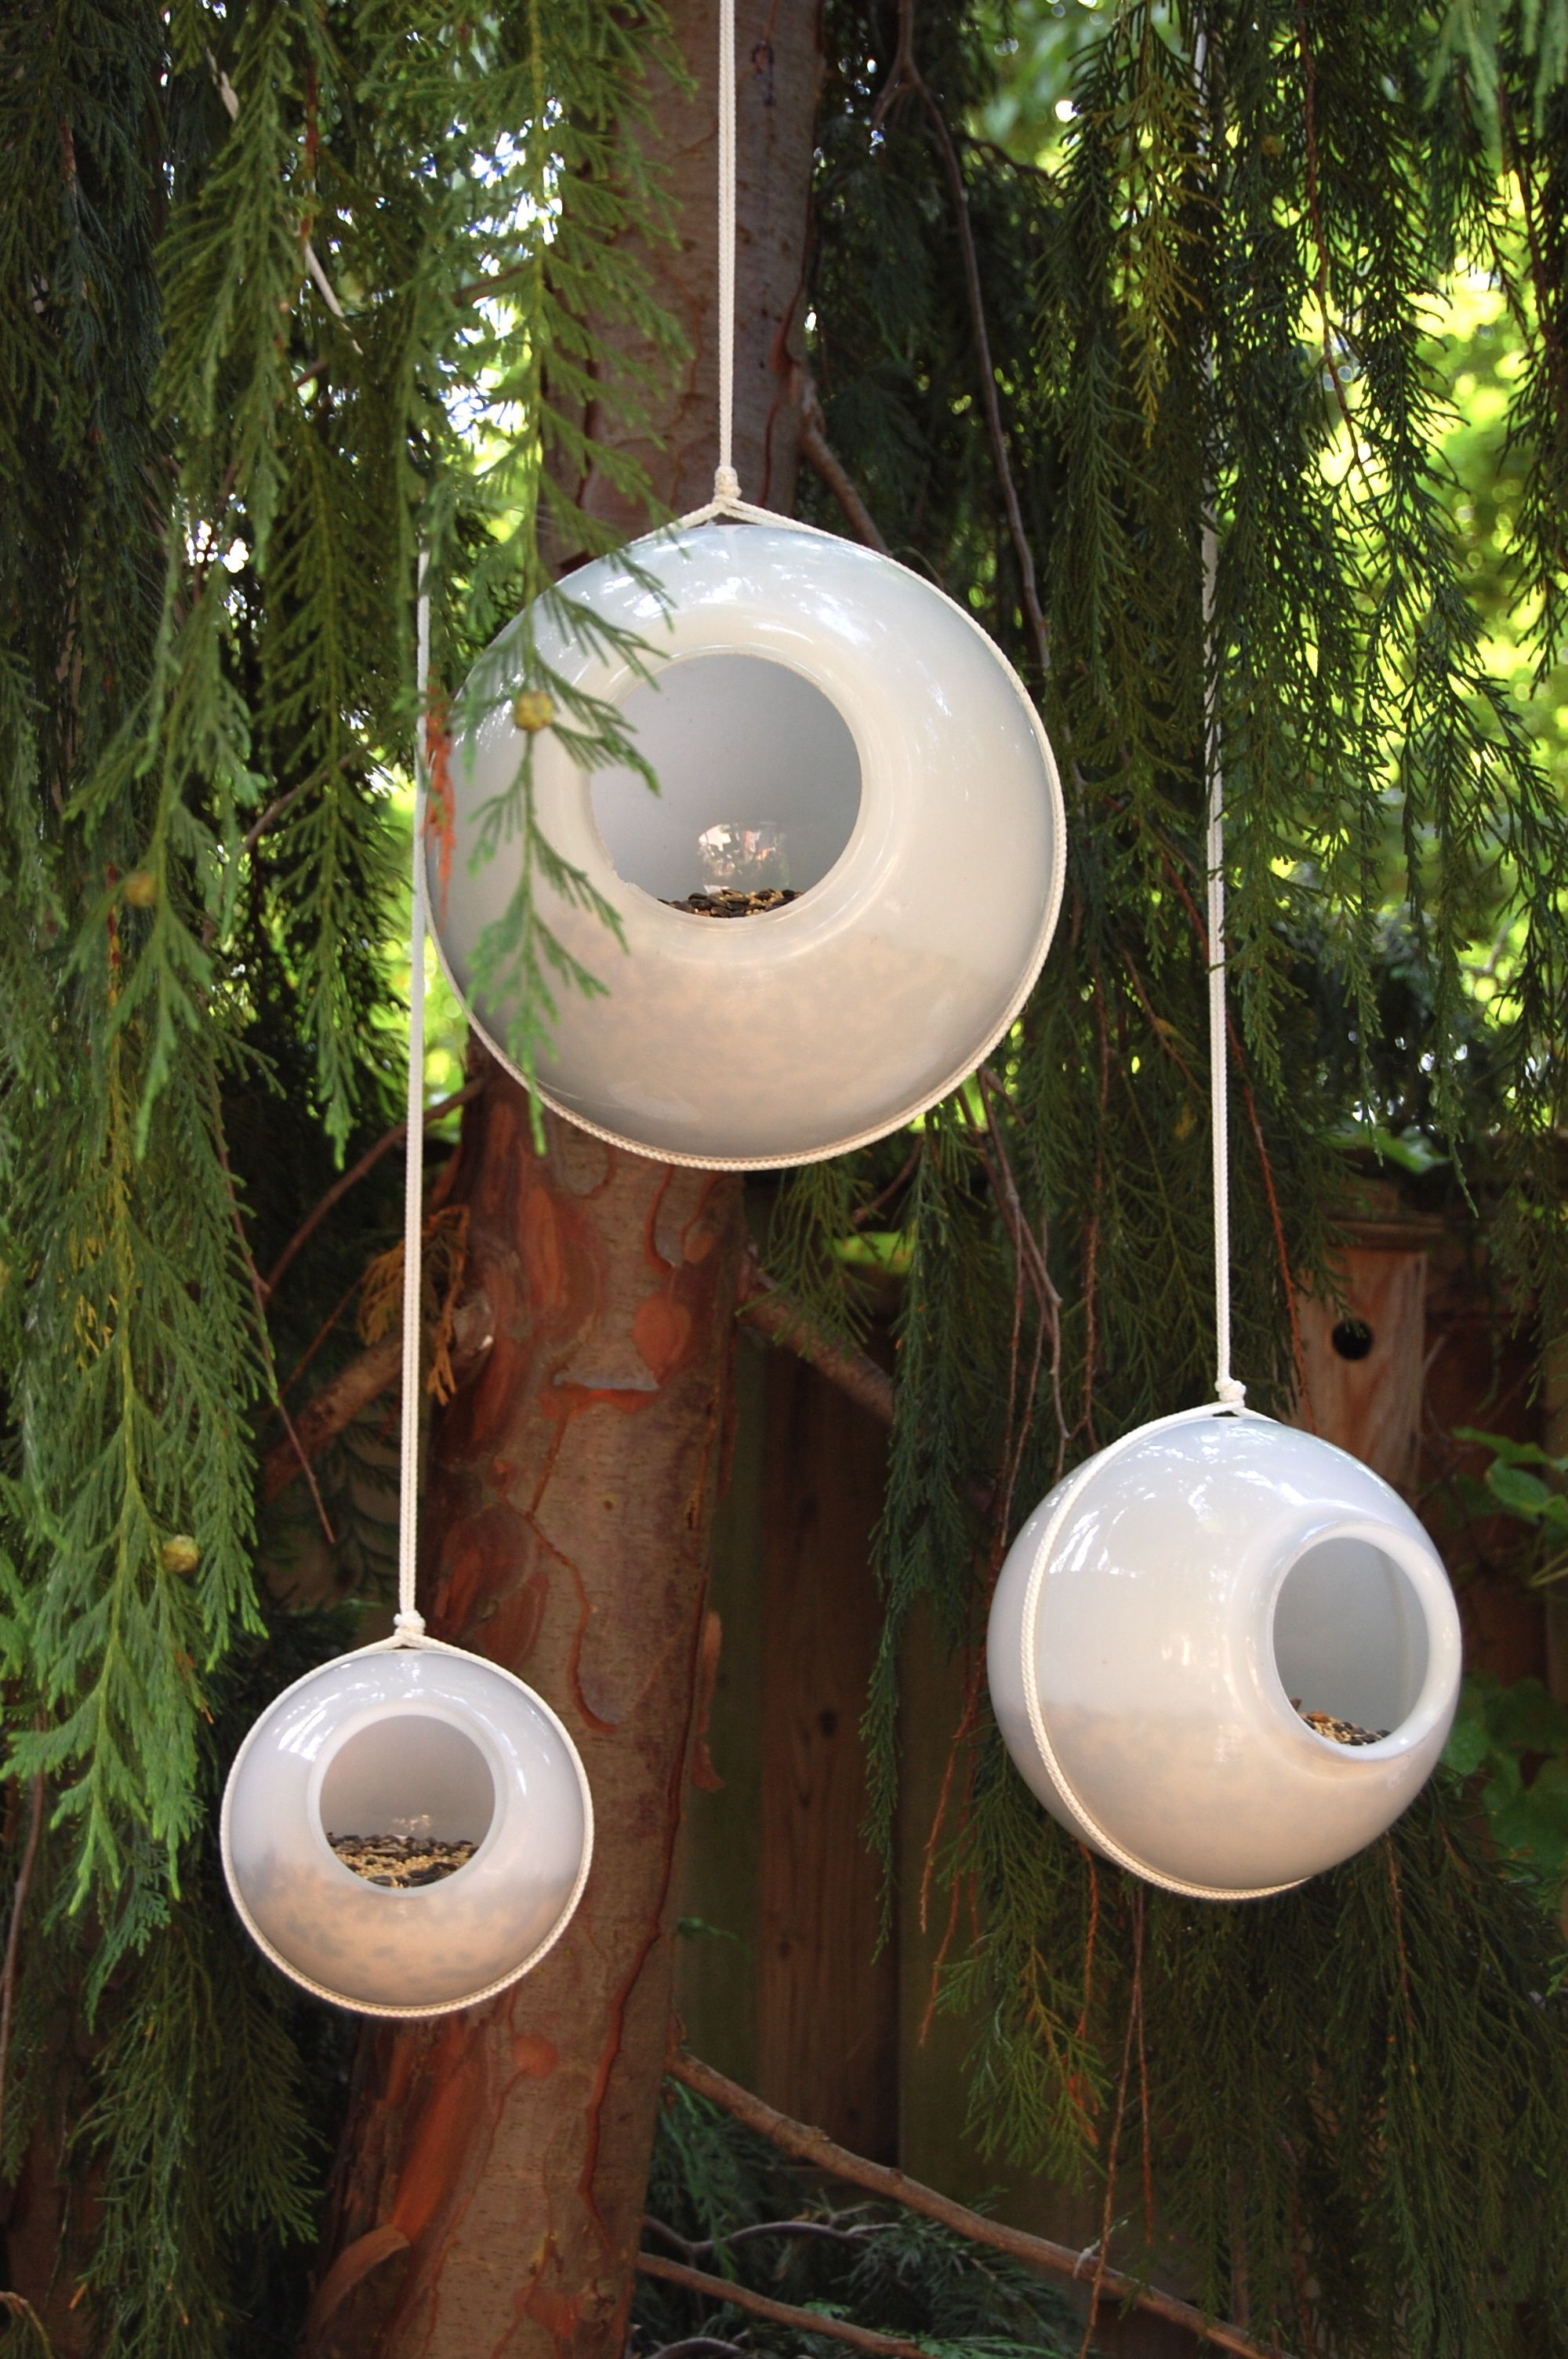 Great Bird Feeder Idea And Very Charming I Am So